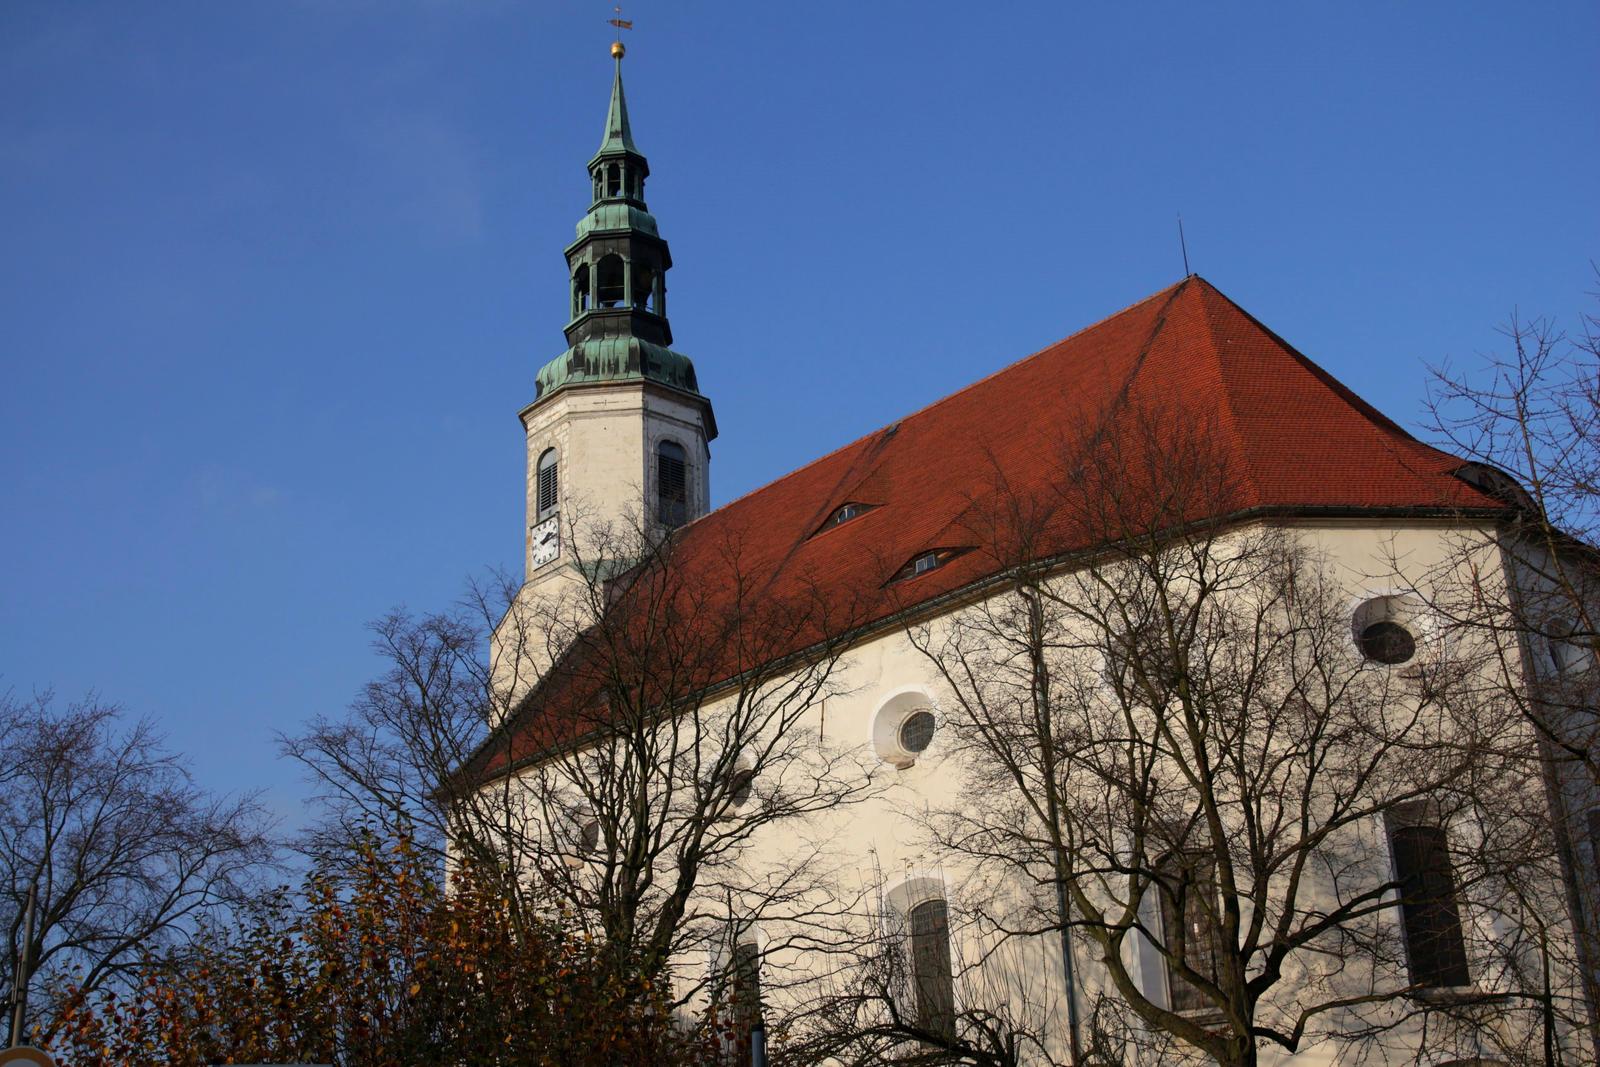 Church at Eibau, Germany by LoveForDetails